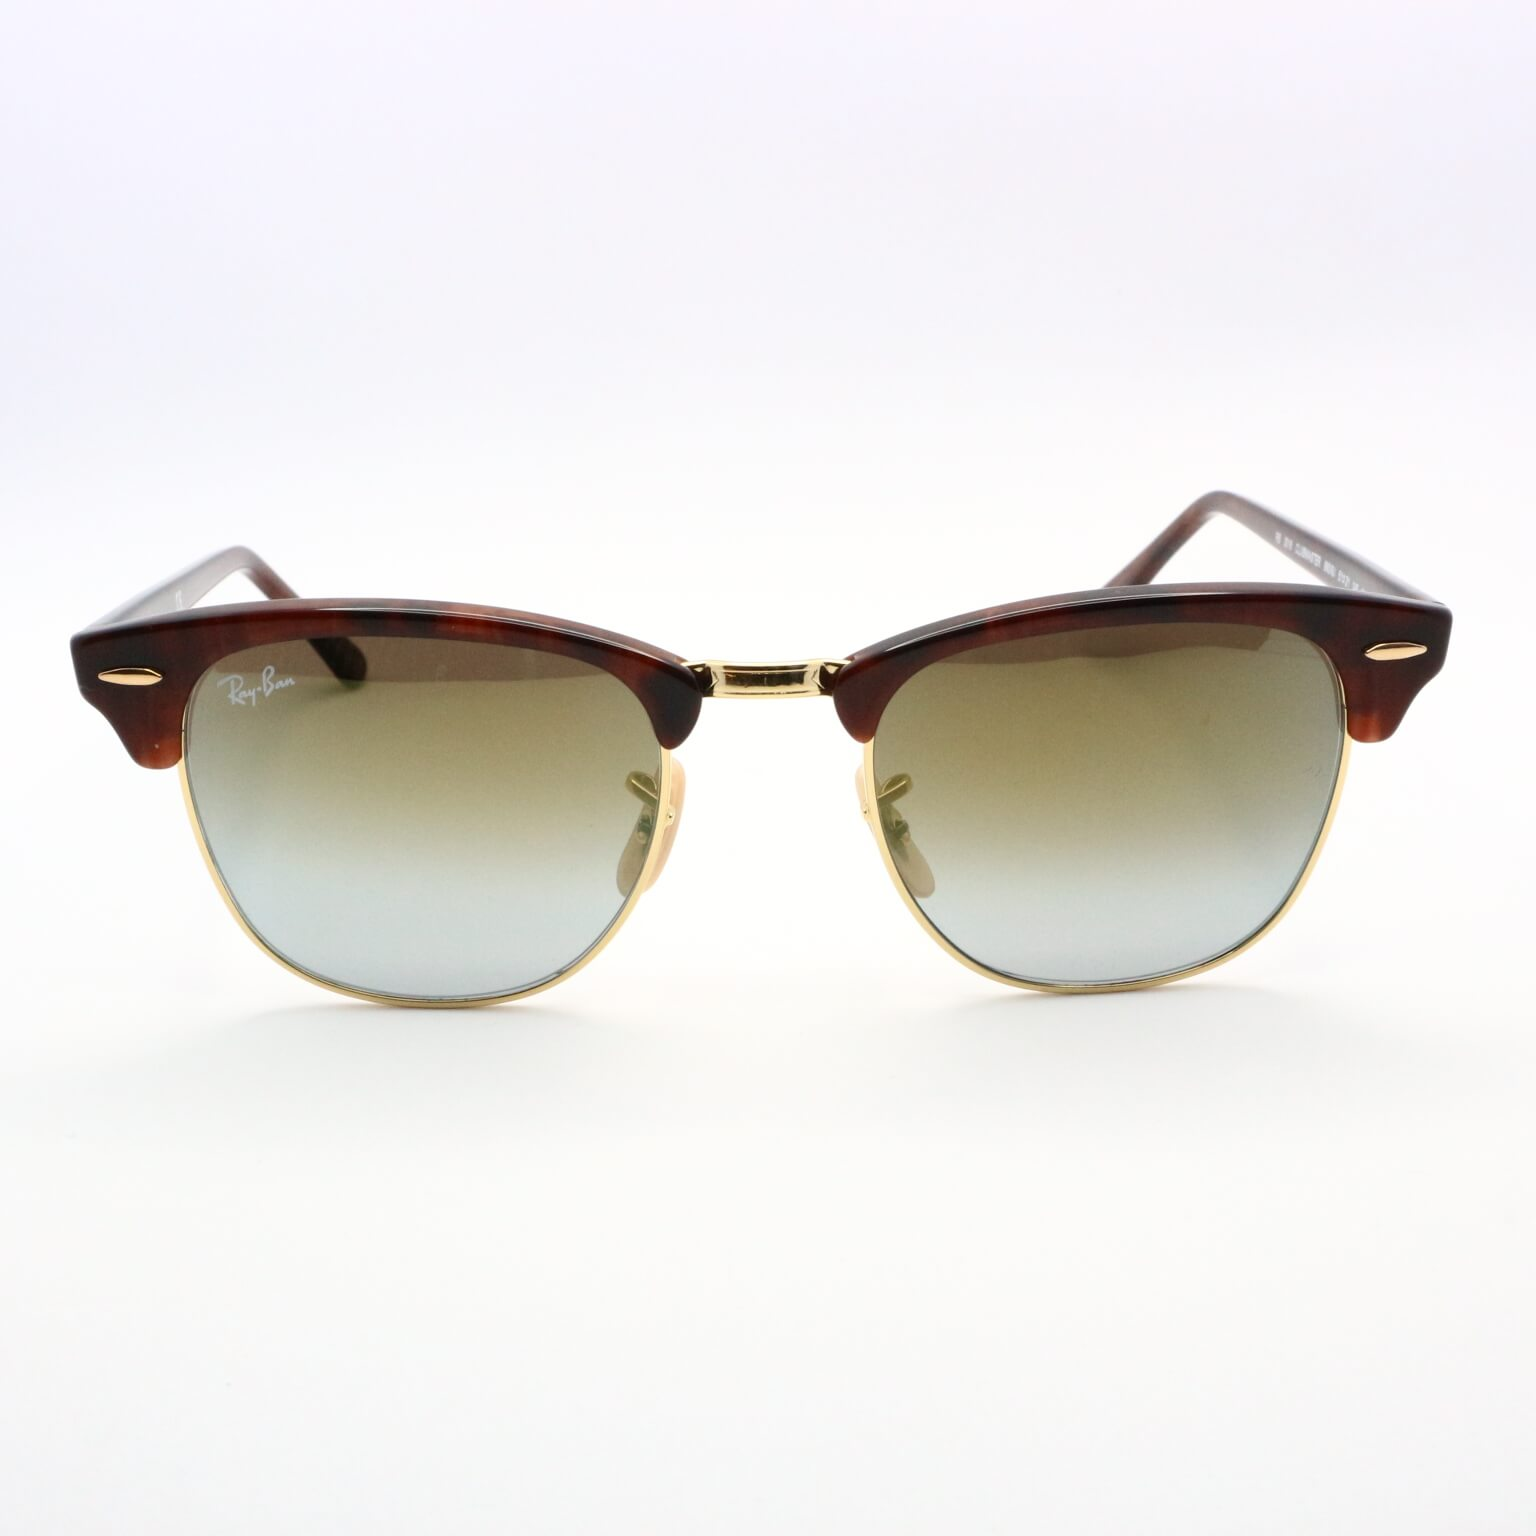 914b7d784e γυαλιά ηλίου Ray Ban Clubmaster 3016 Large